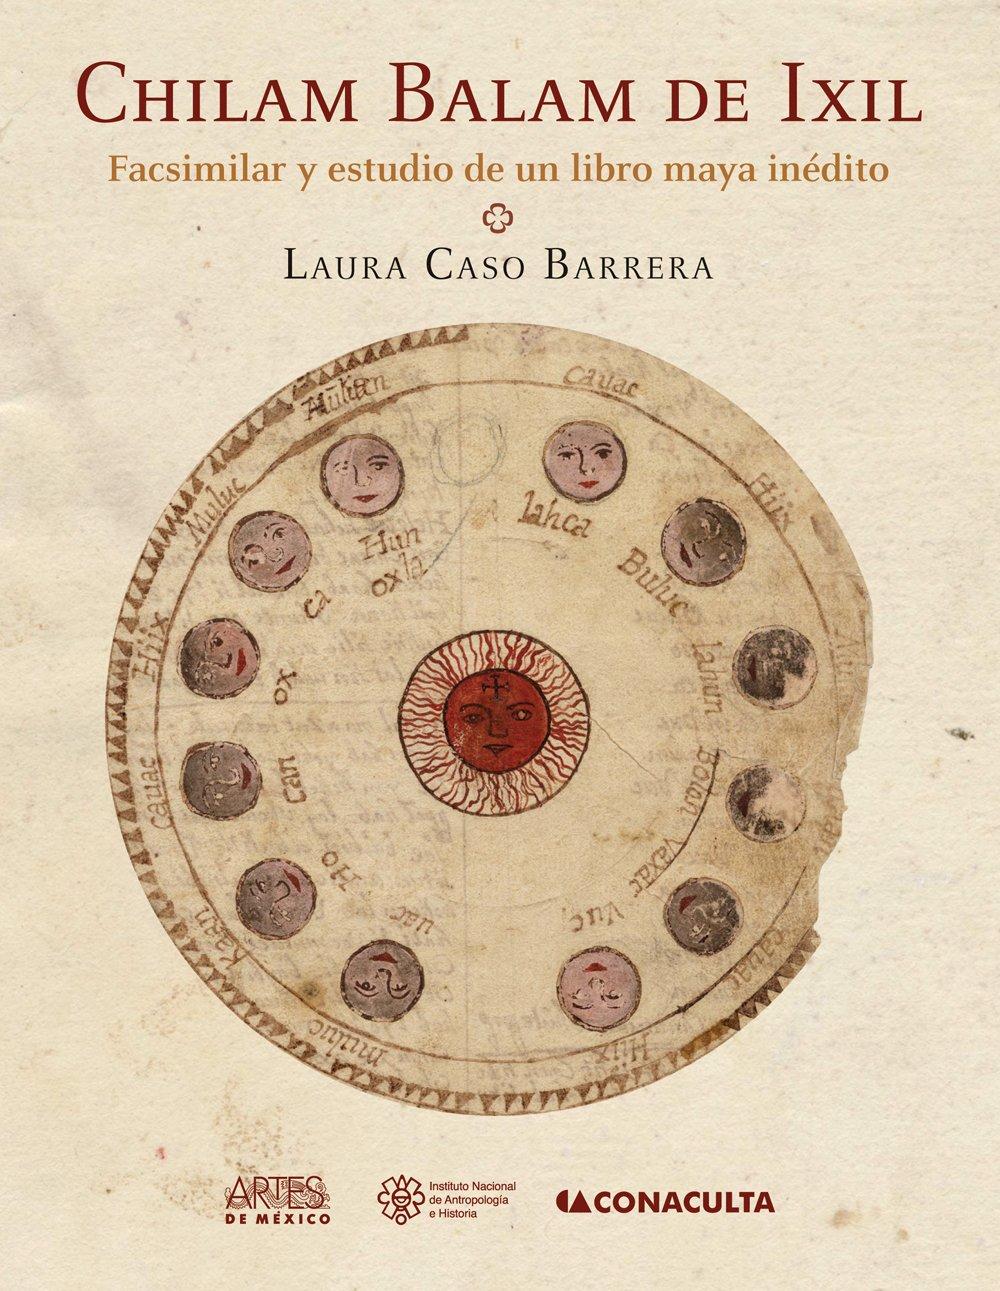 Chilam Balam De IXIL: Facsmiliar y estudio de un libro maya inedito / Facsimile and Study of an Unpublished Book Maya (Spanish Edition)